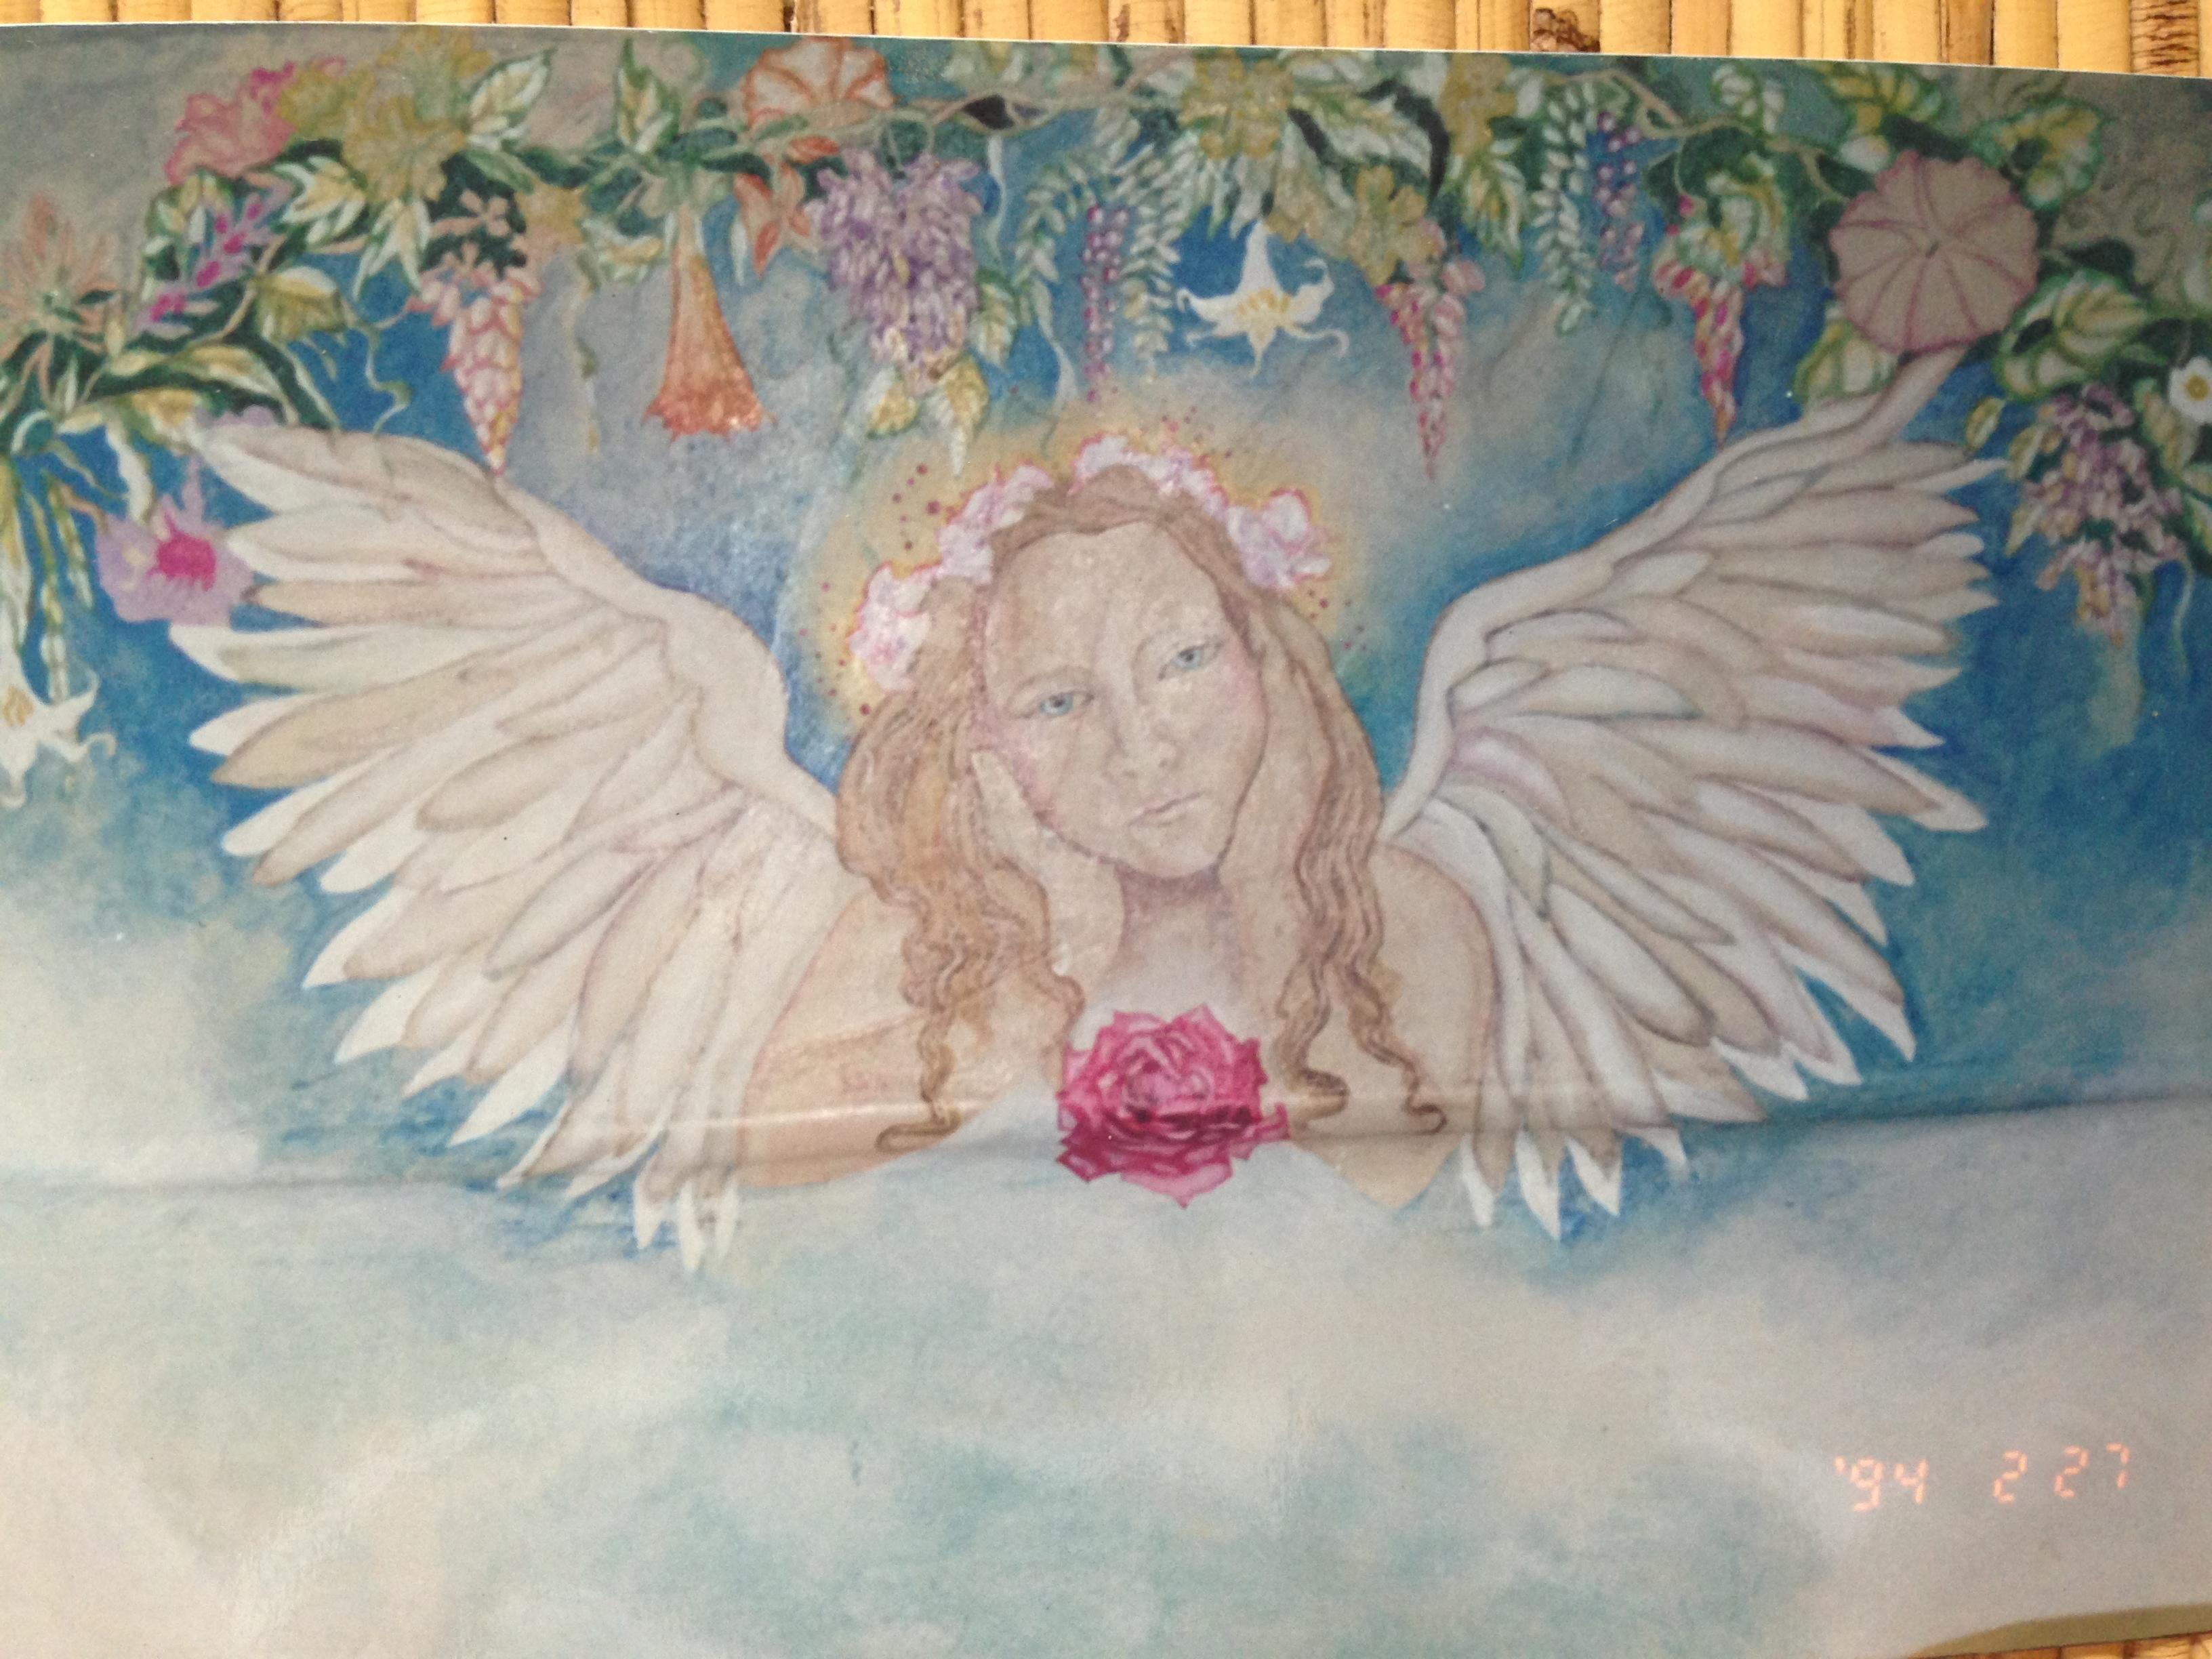 Jungel Angel